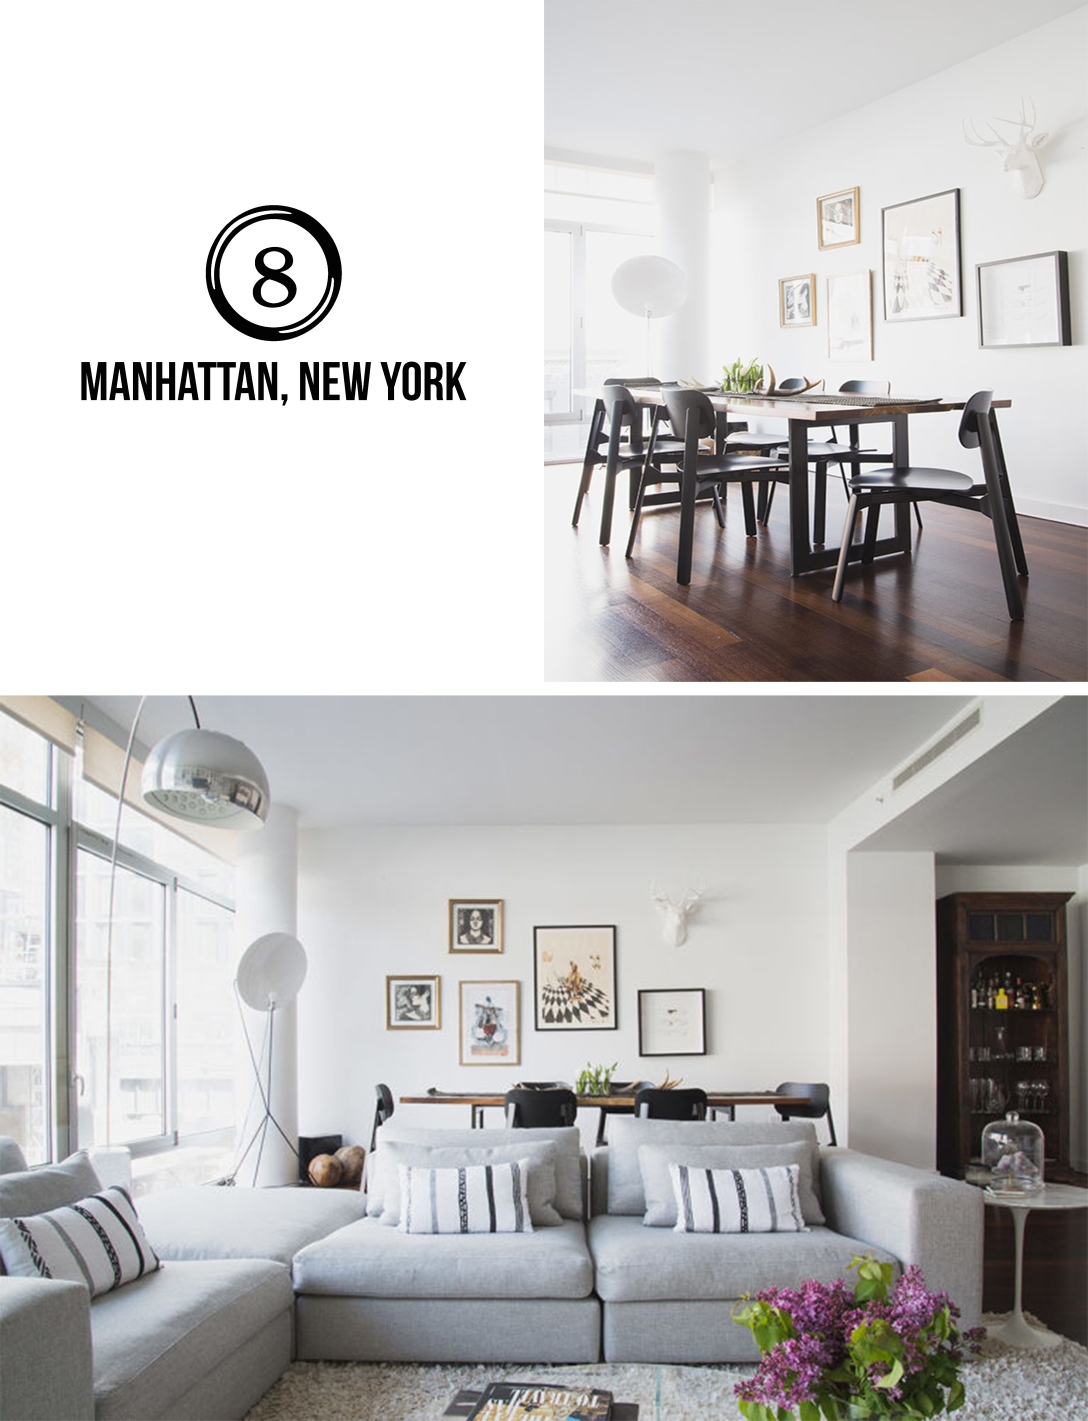 manhattan, new york2